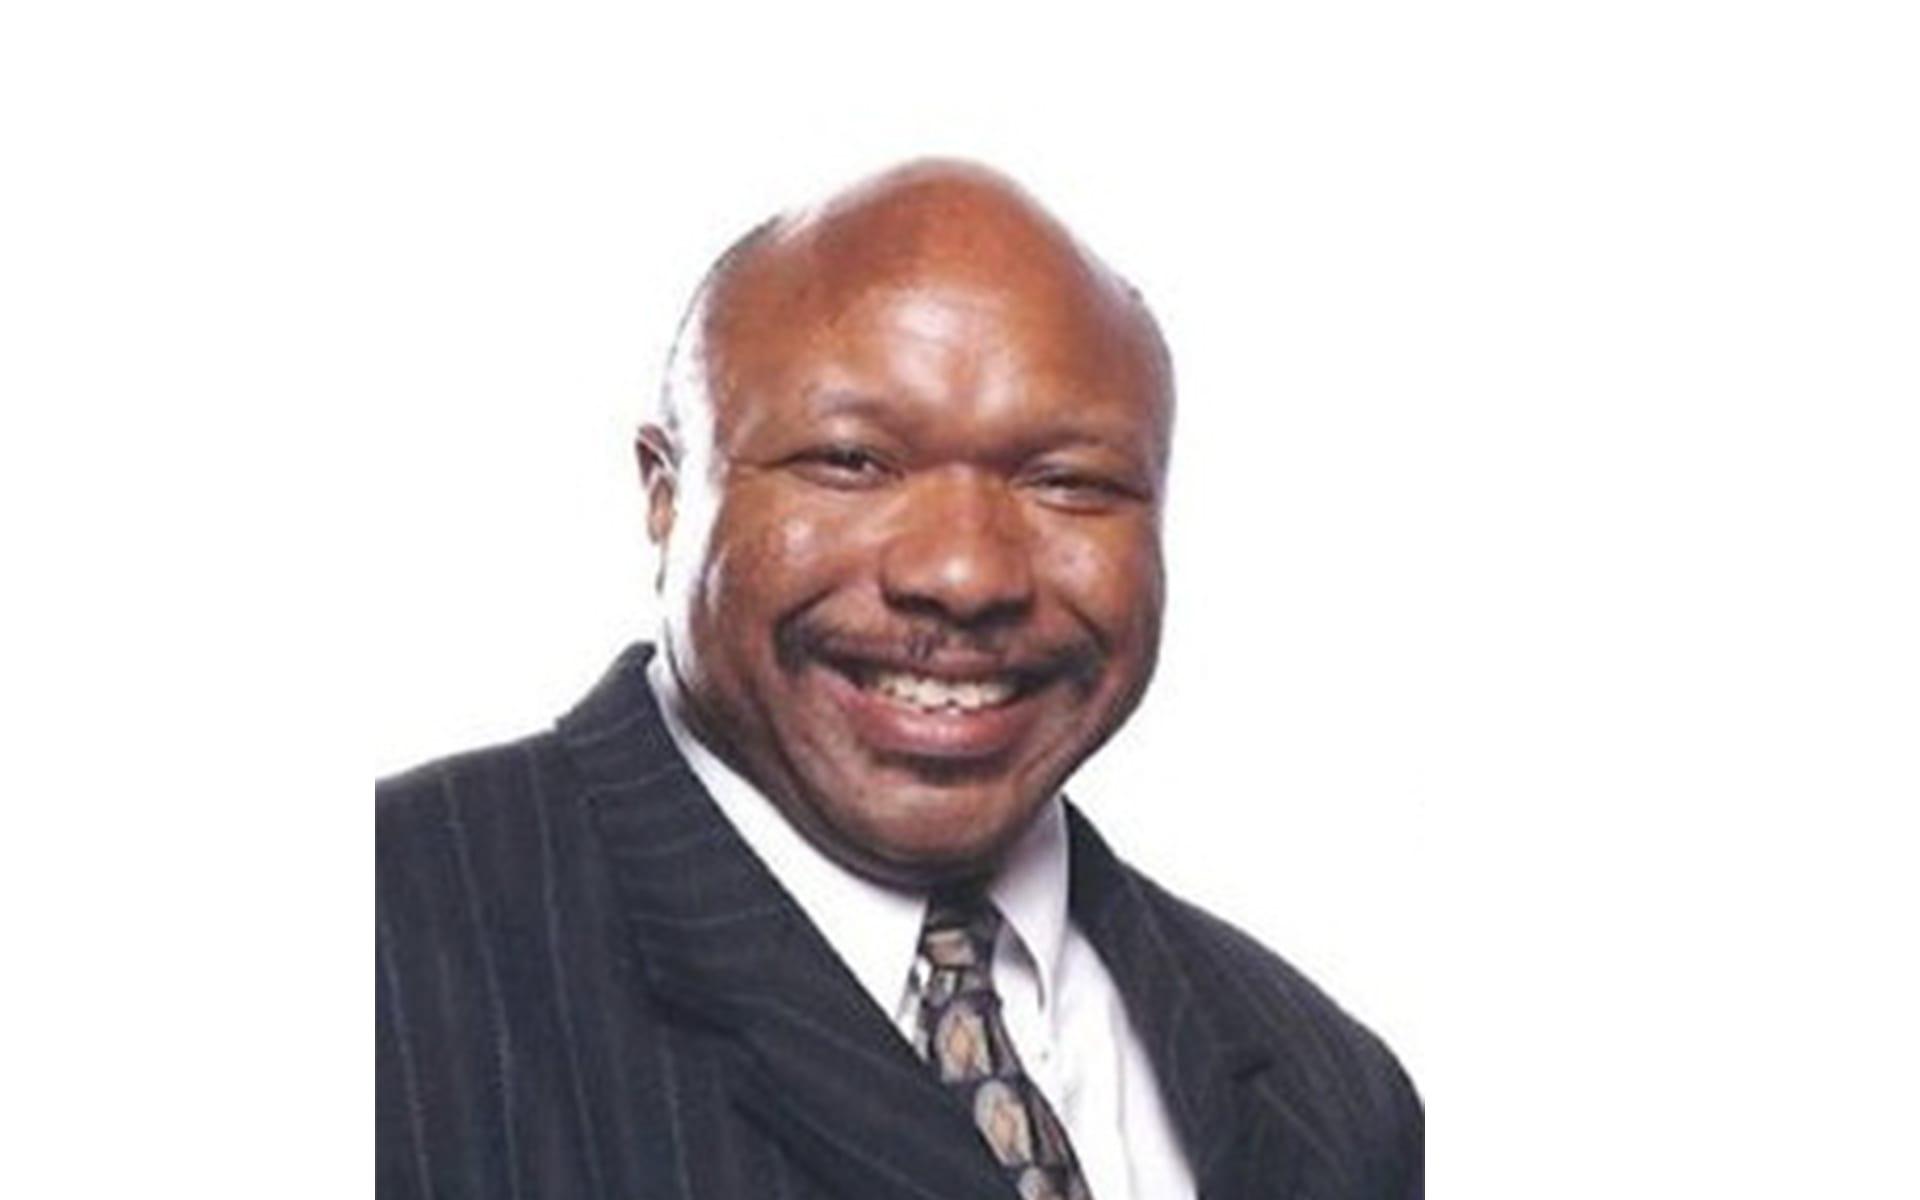 Simmons chapel headshot